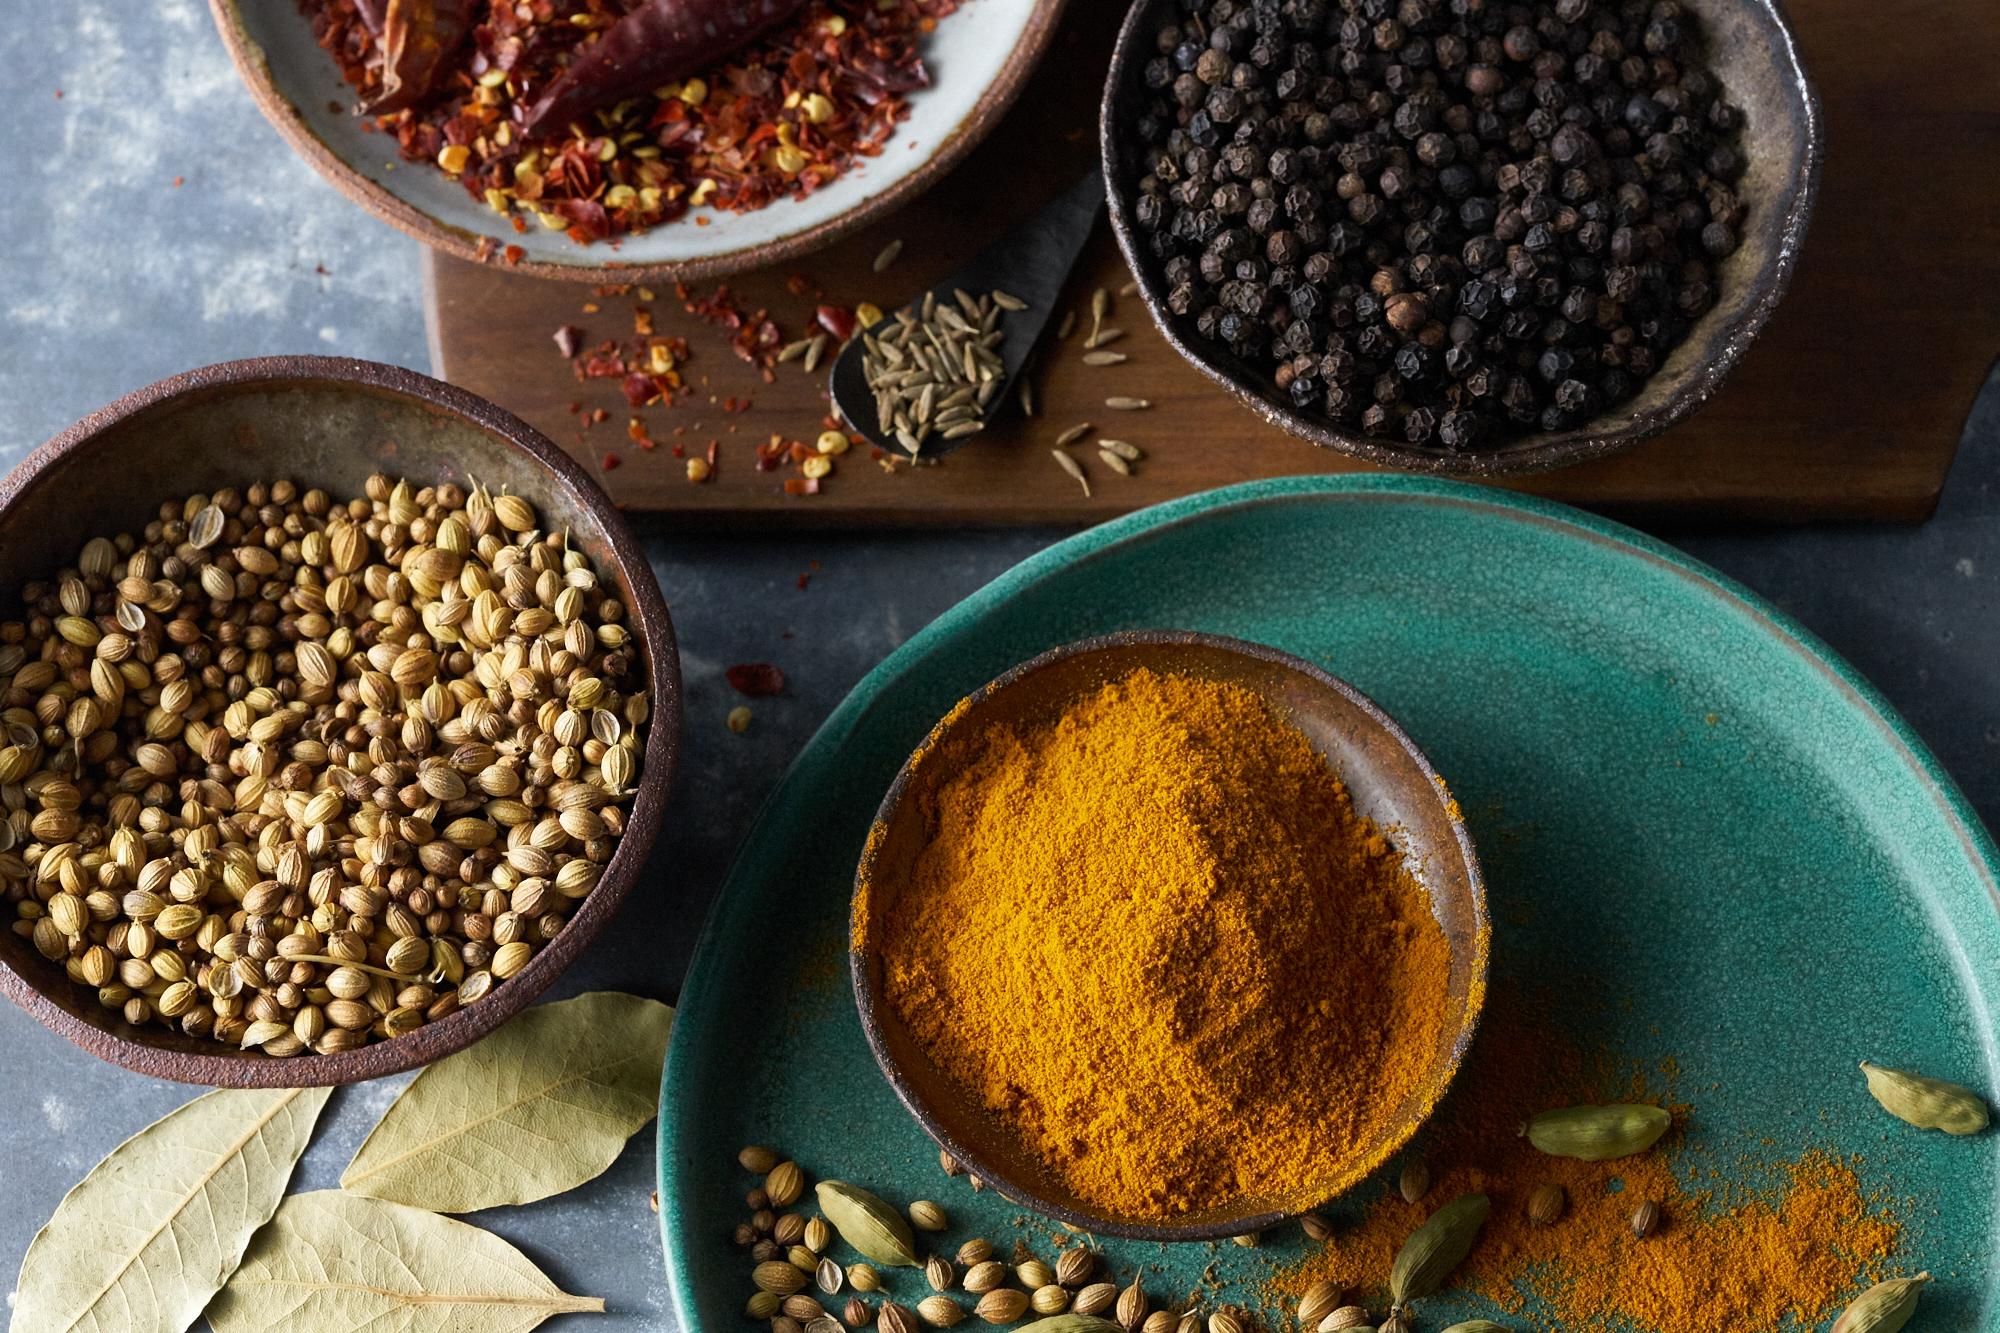 Spice_0541.jpg